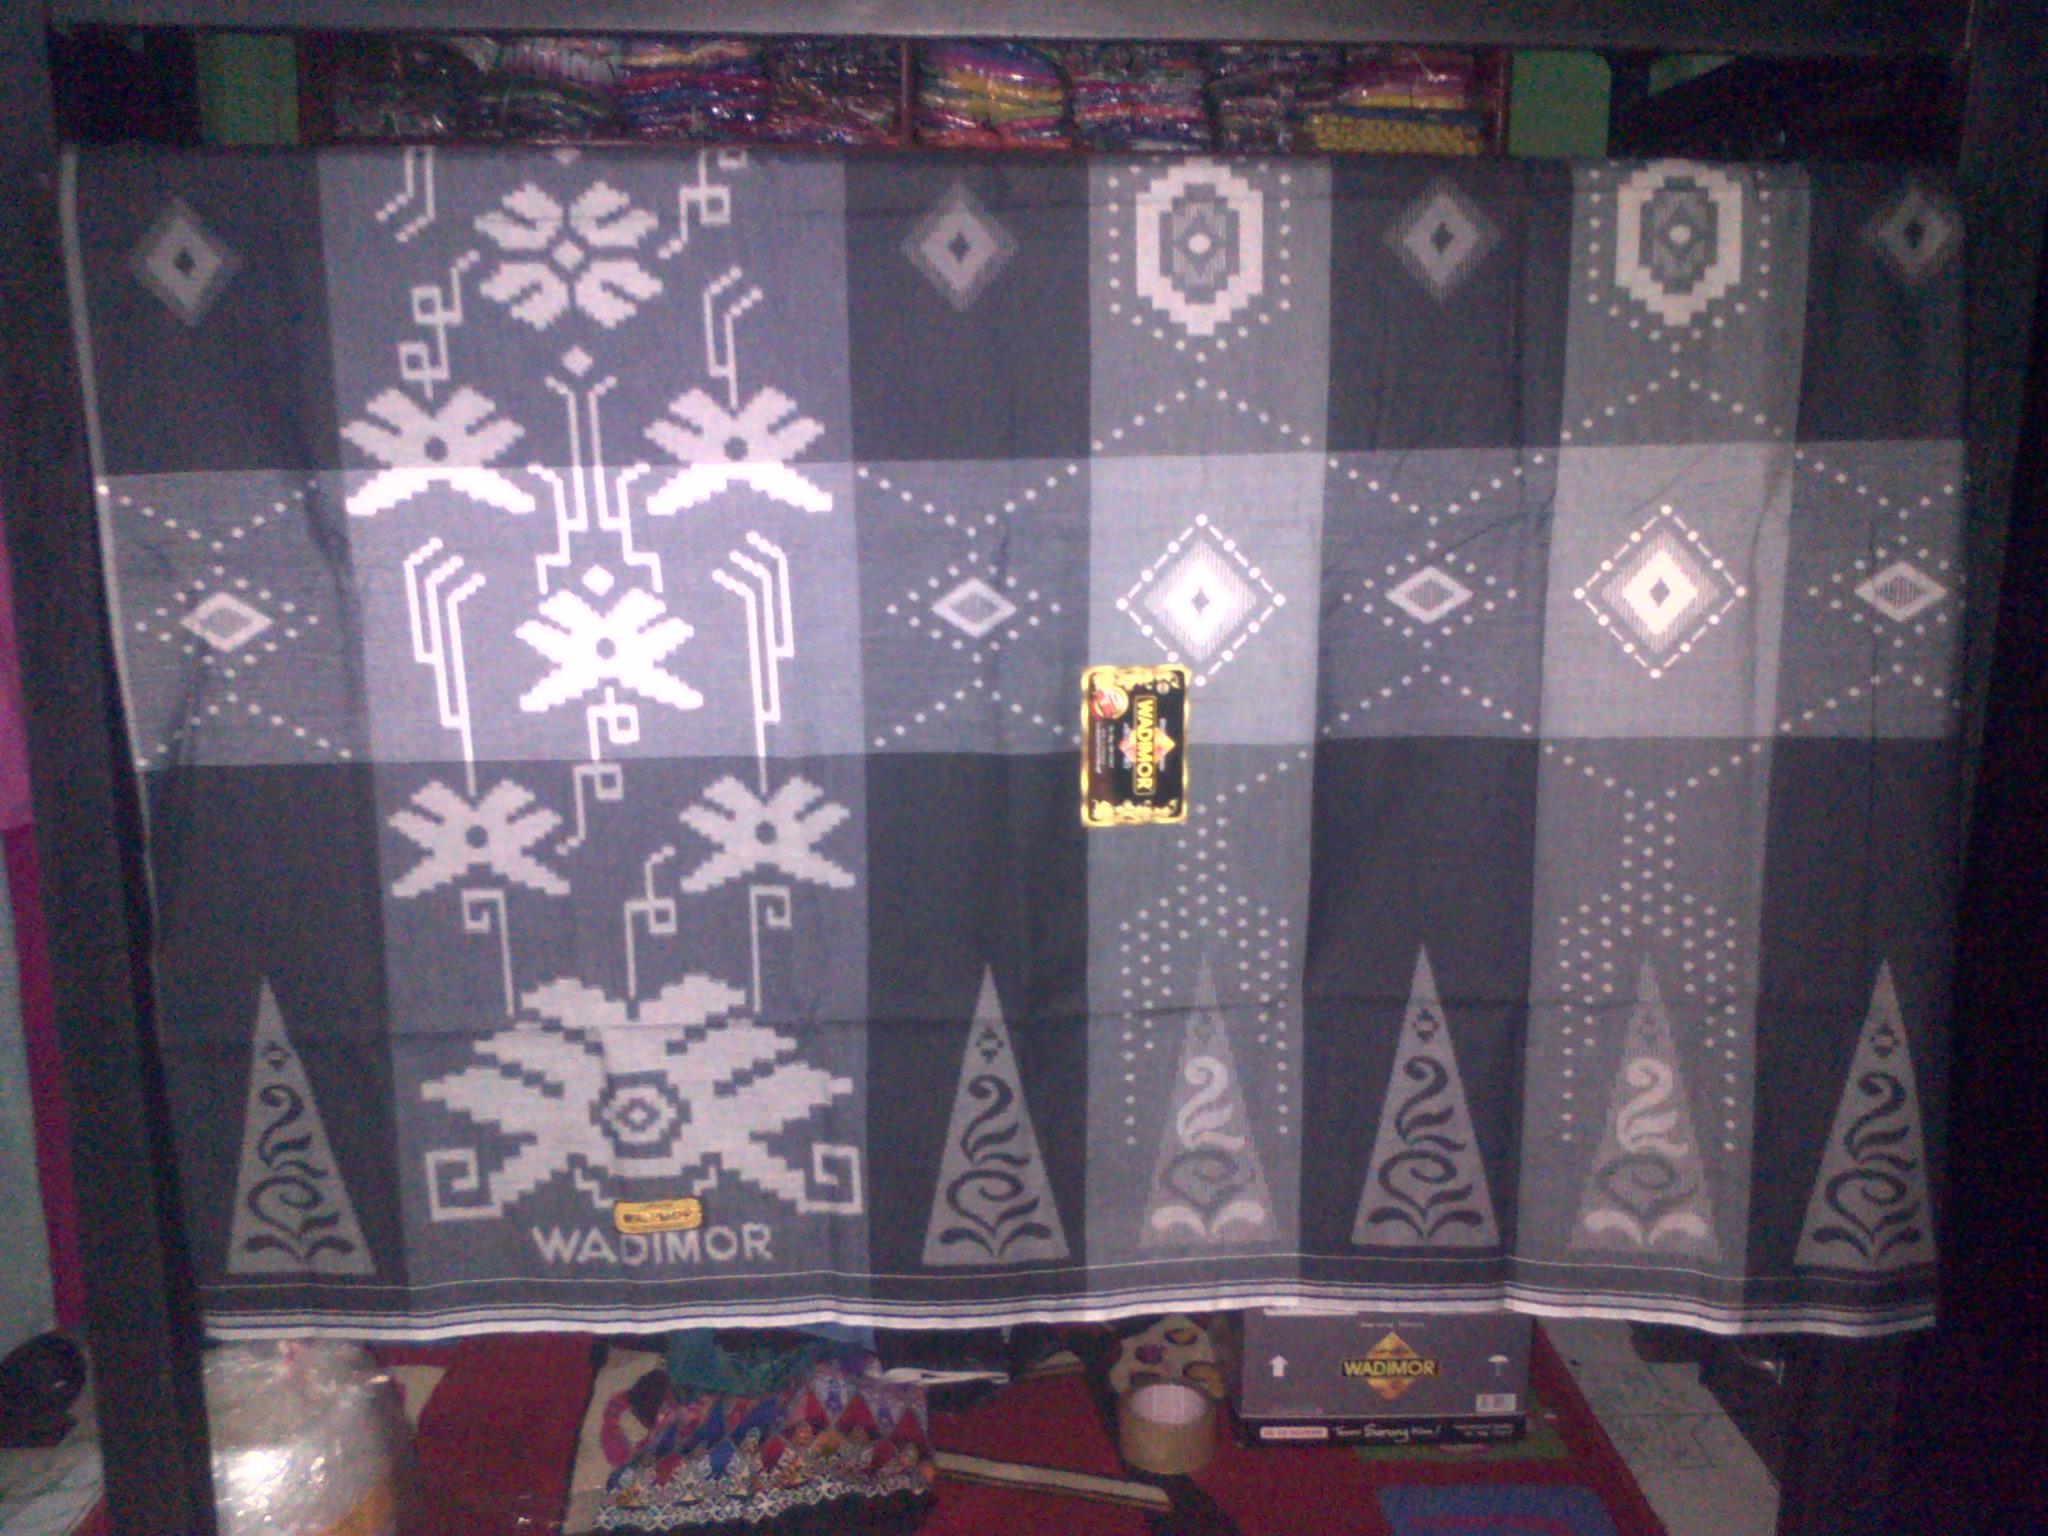 Sarung Ibadah Pusat Grosir Baju Batik Modern Pekalongan Murah Wadimor  Img 20150414 00037